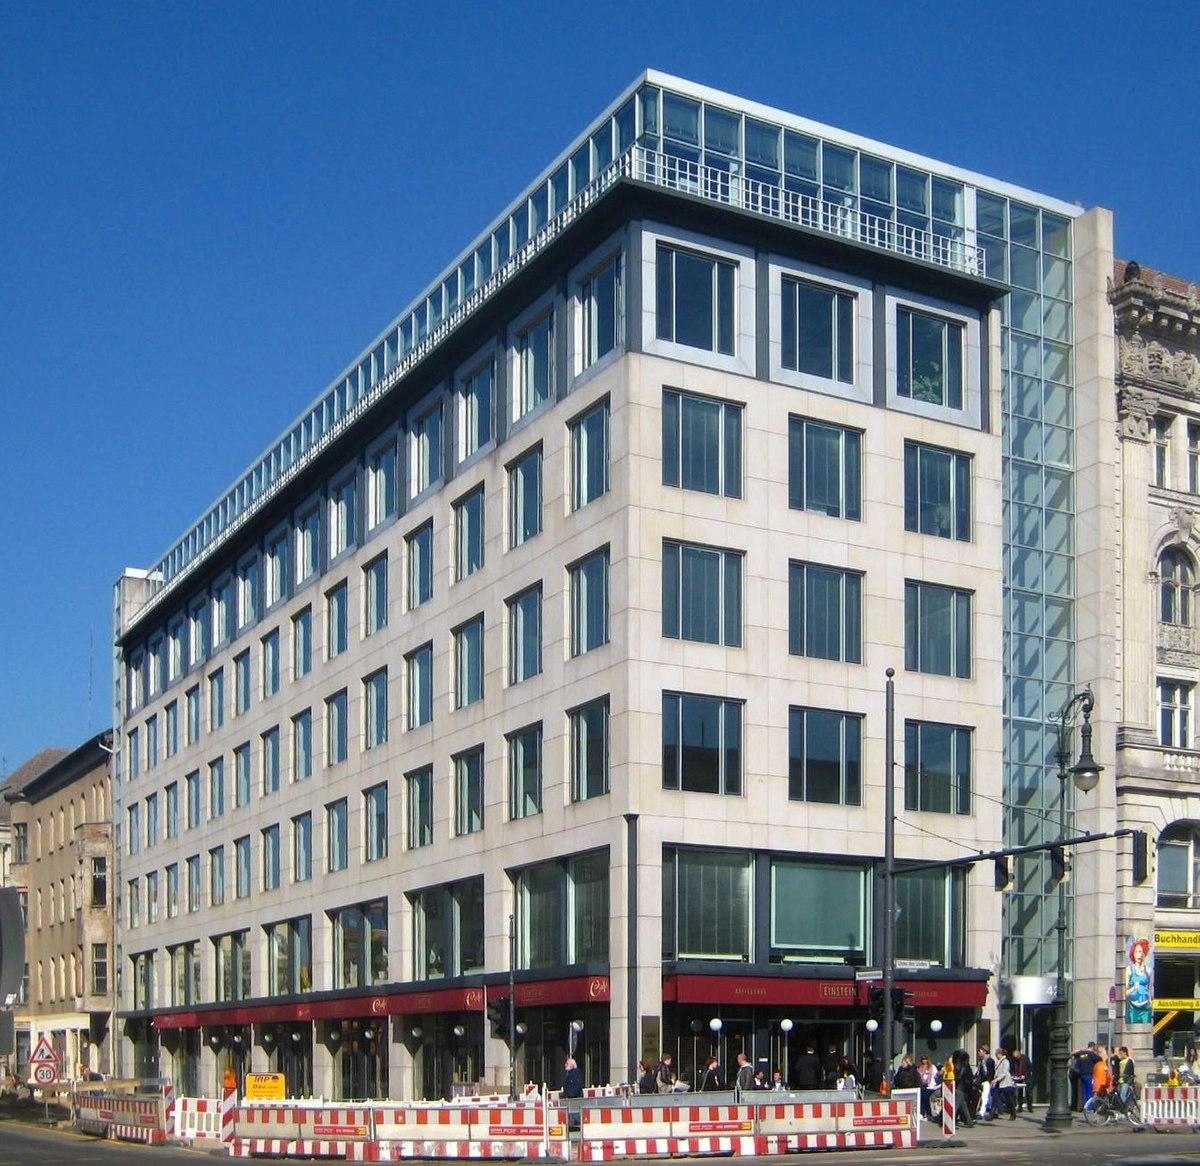 File:Berlin, Mitte, Unter den Linden 42, Haus Pietzsch.jpg